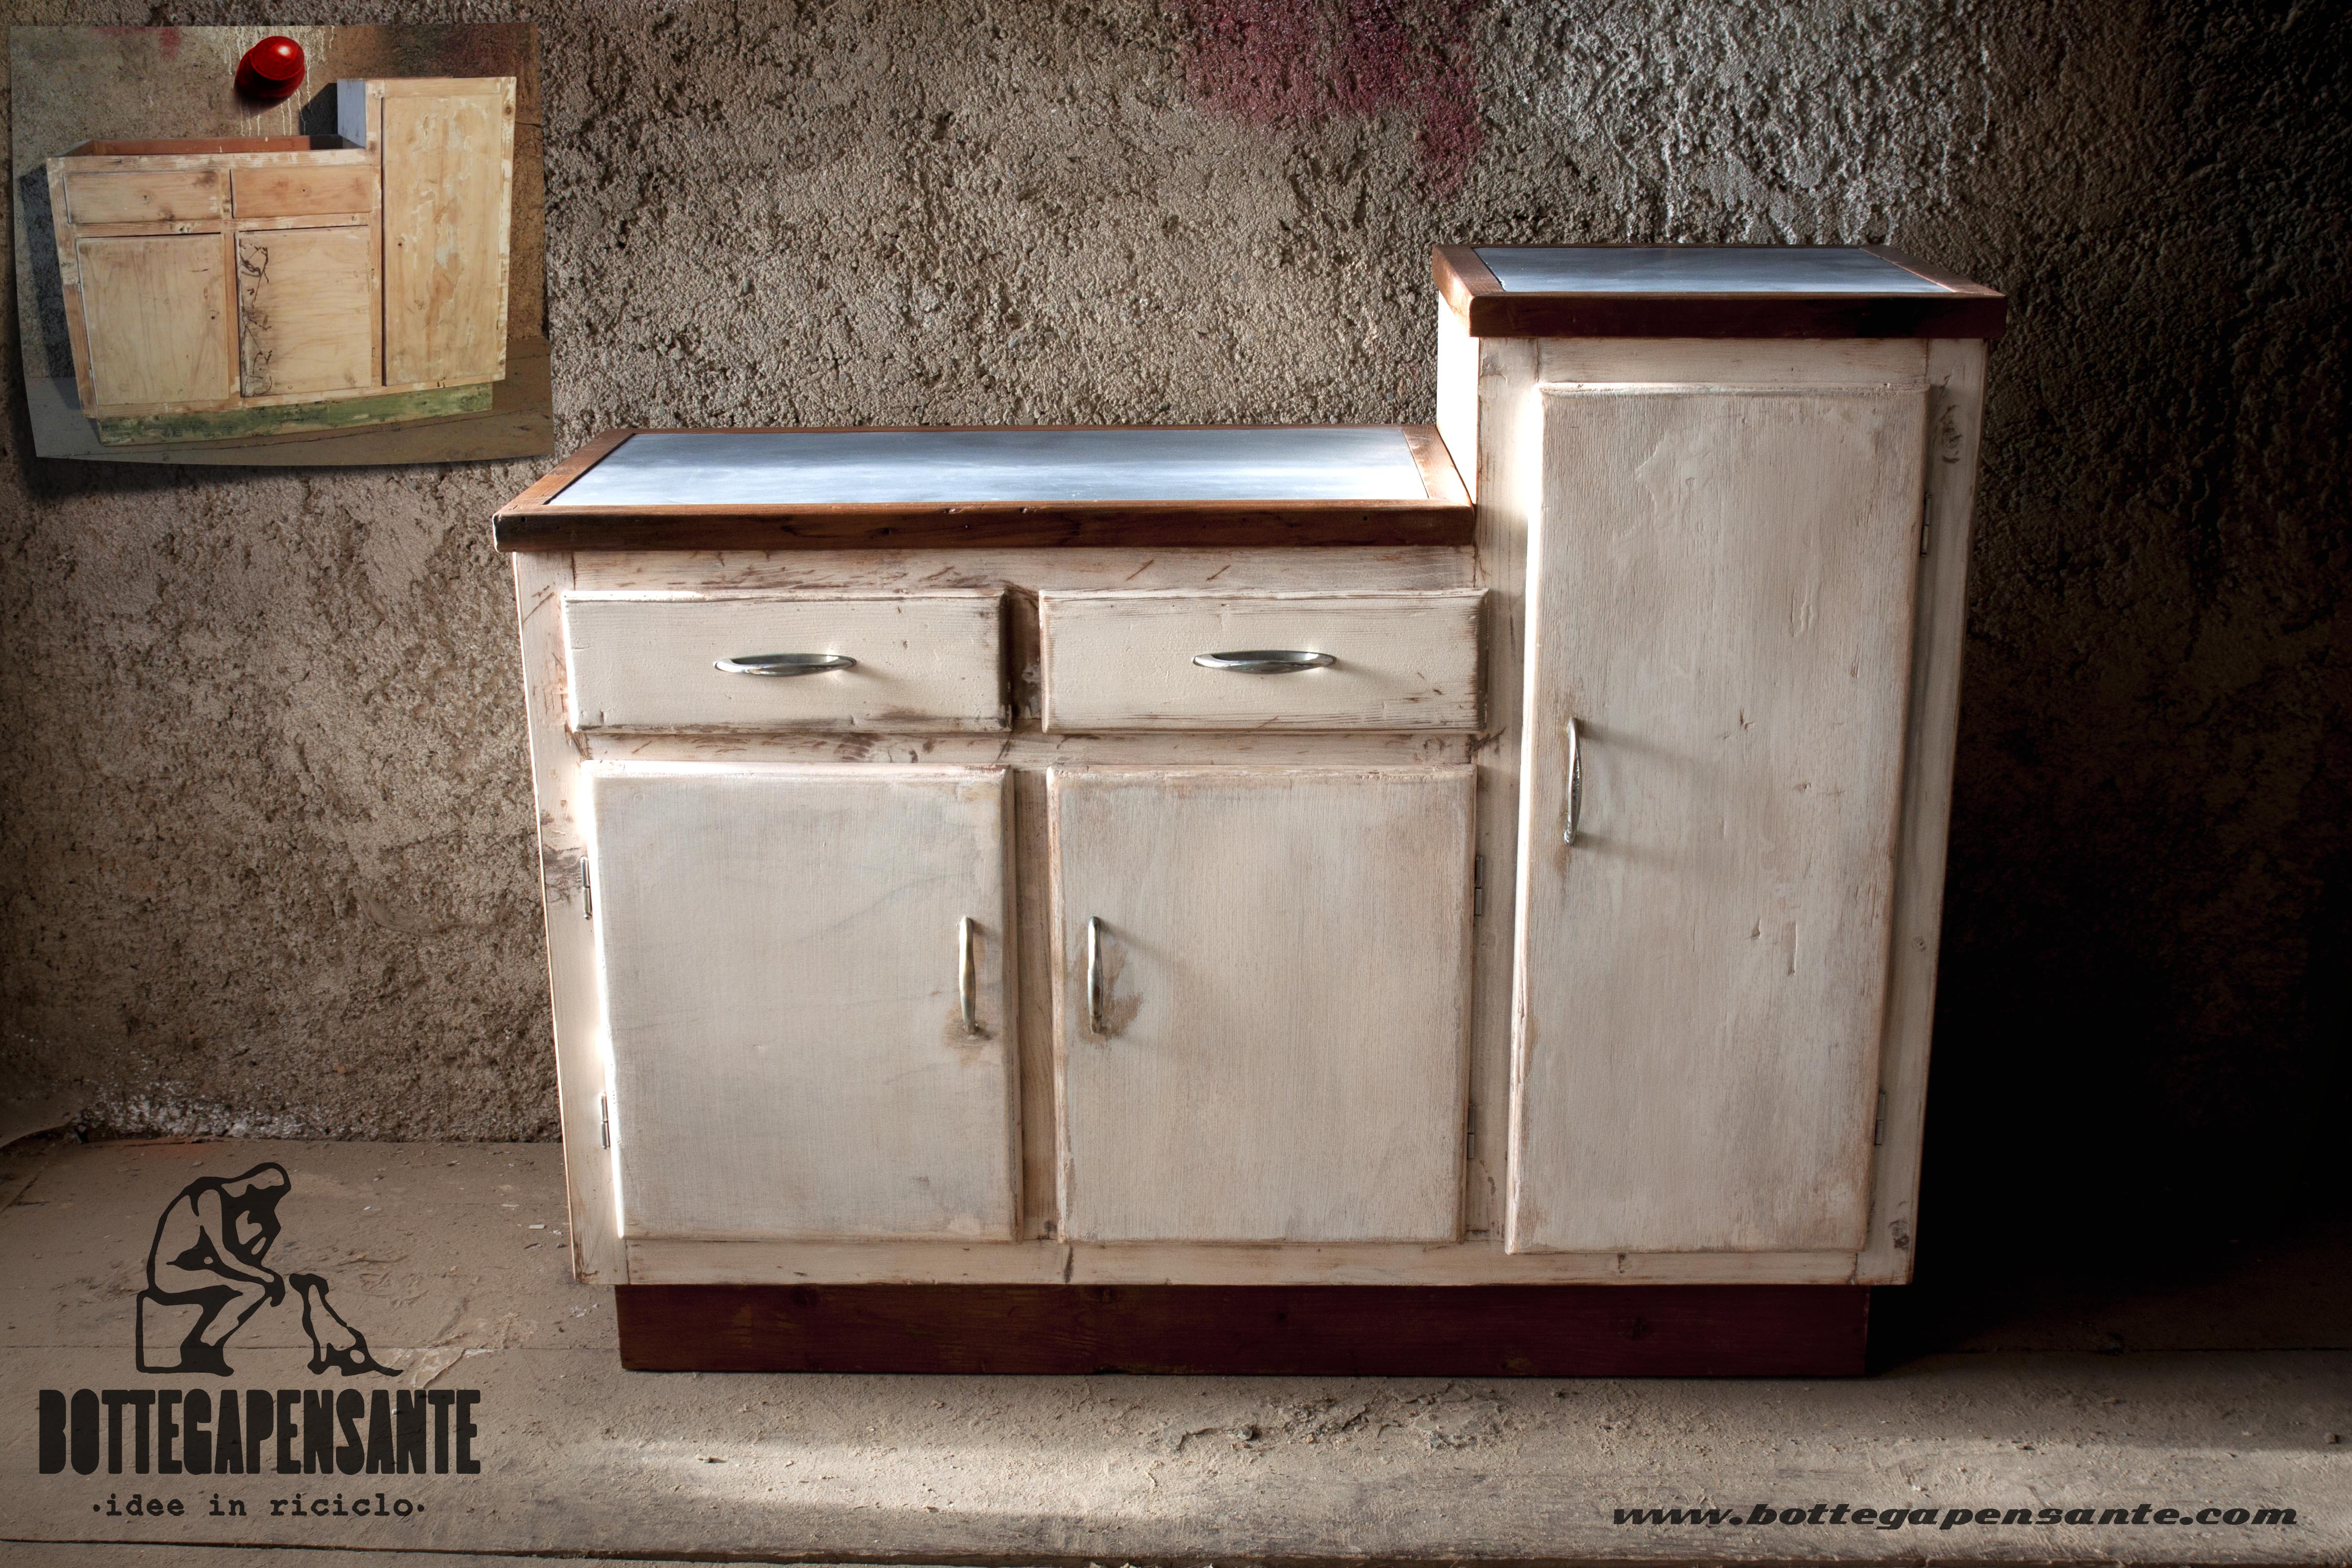 Mobile da cucina bianco riciclato vintage bottega pensante - Quadri cucina vintage ...